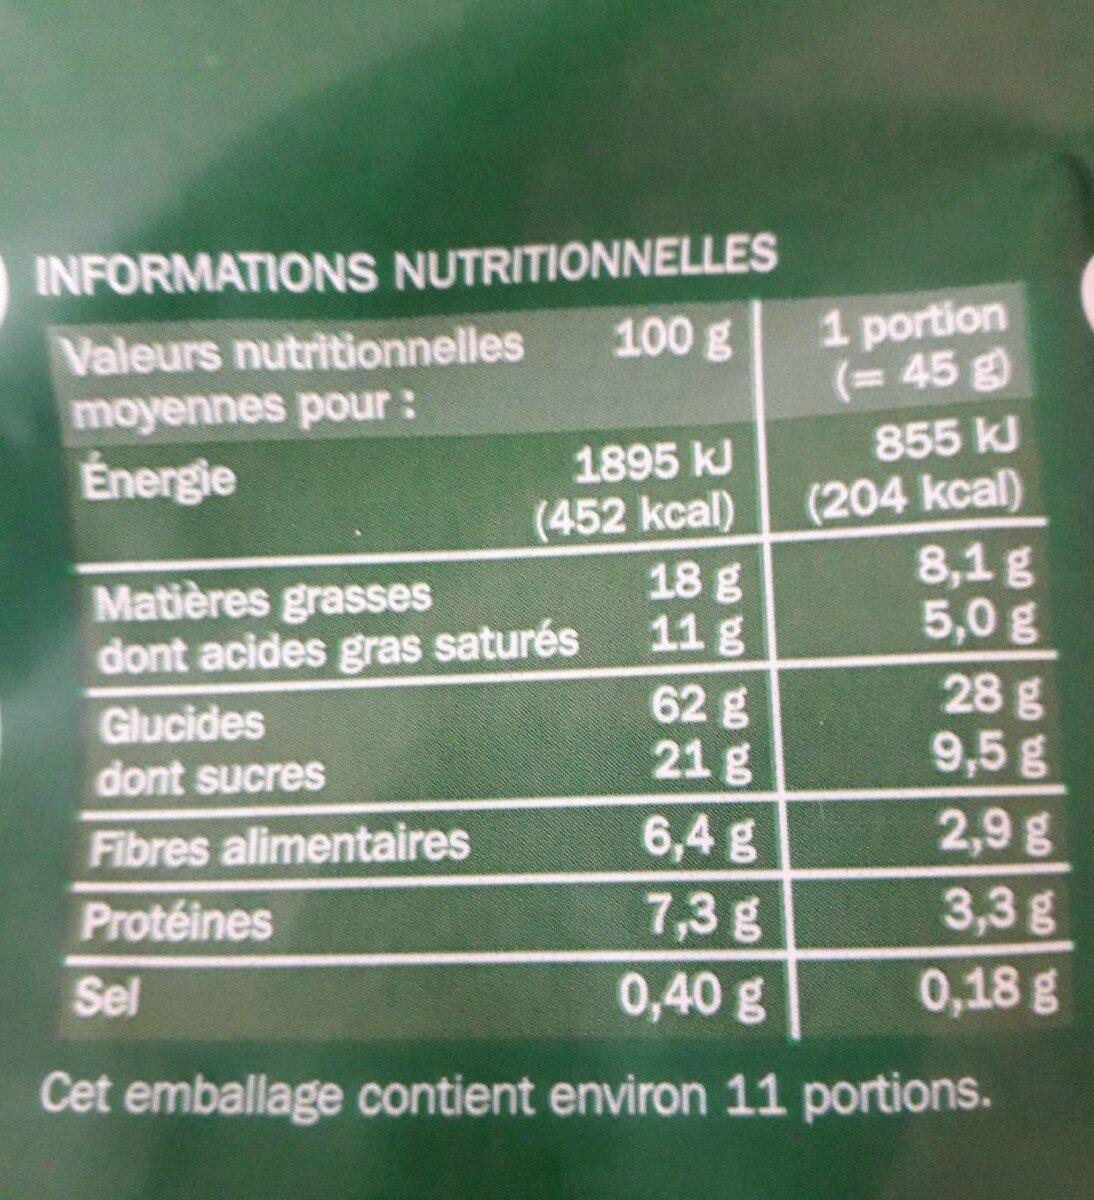 Muesli croustillant aux fruits - Informazioni nutrizionali - fr